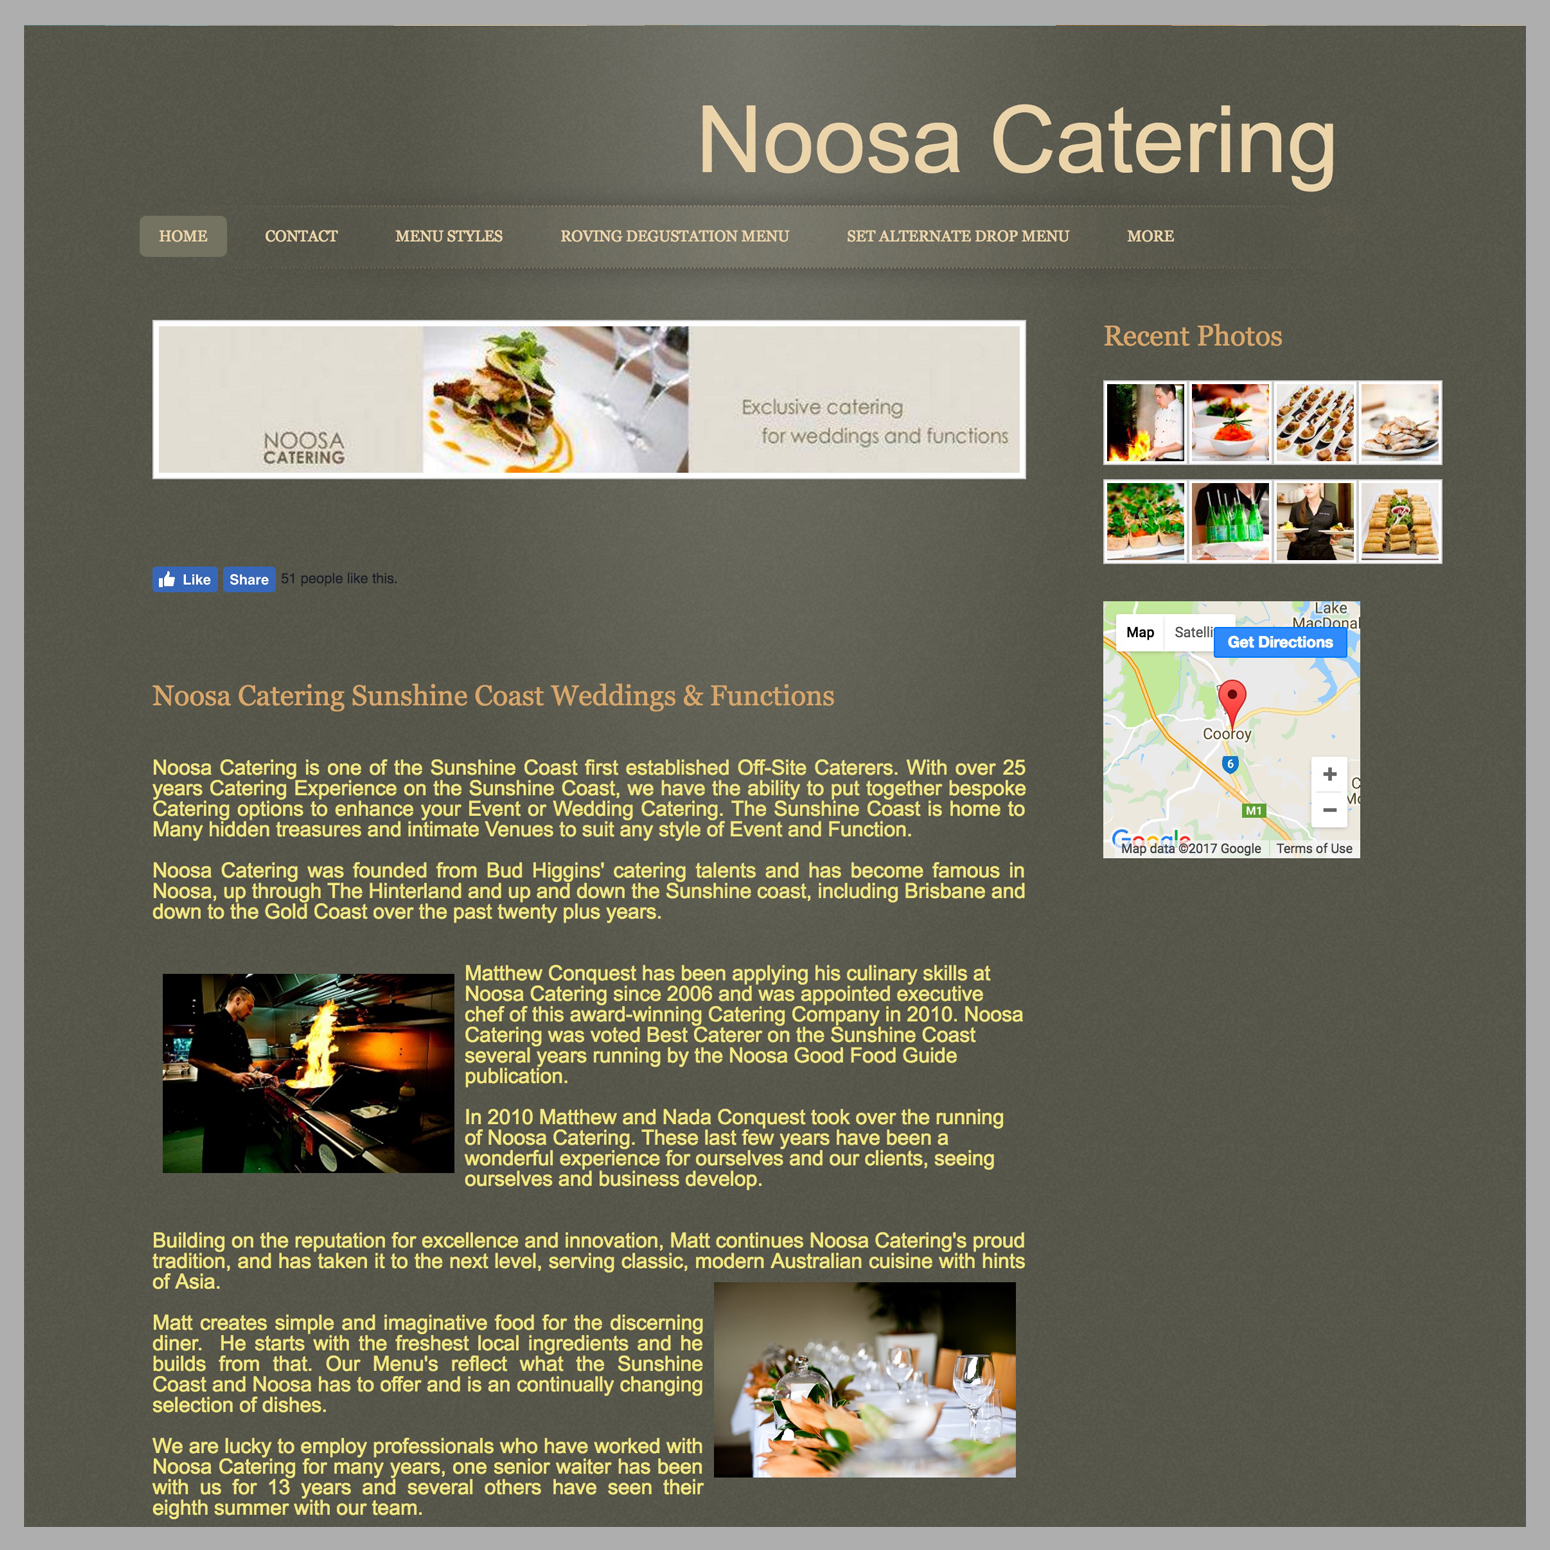 Noosa Catering